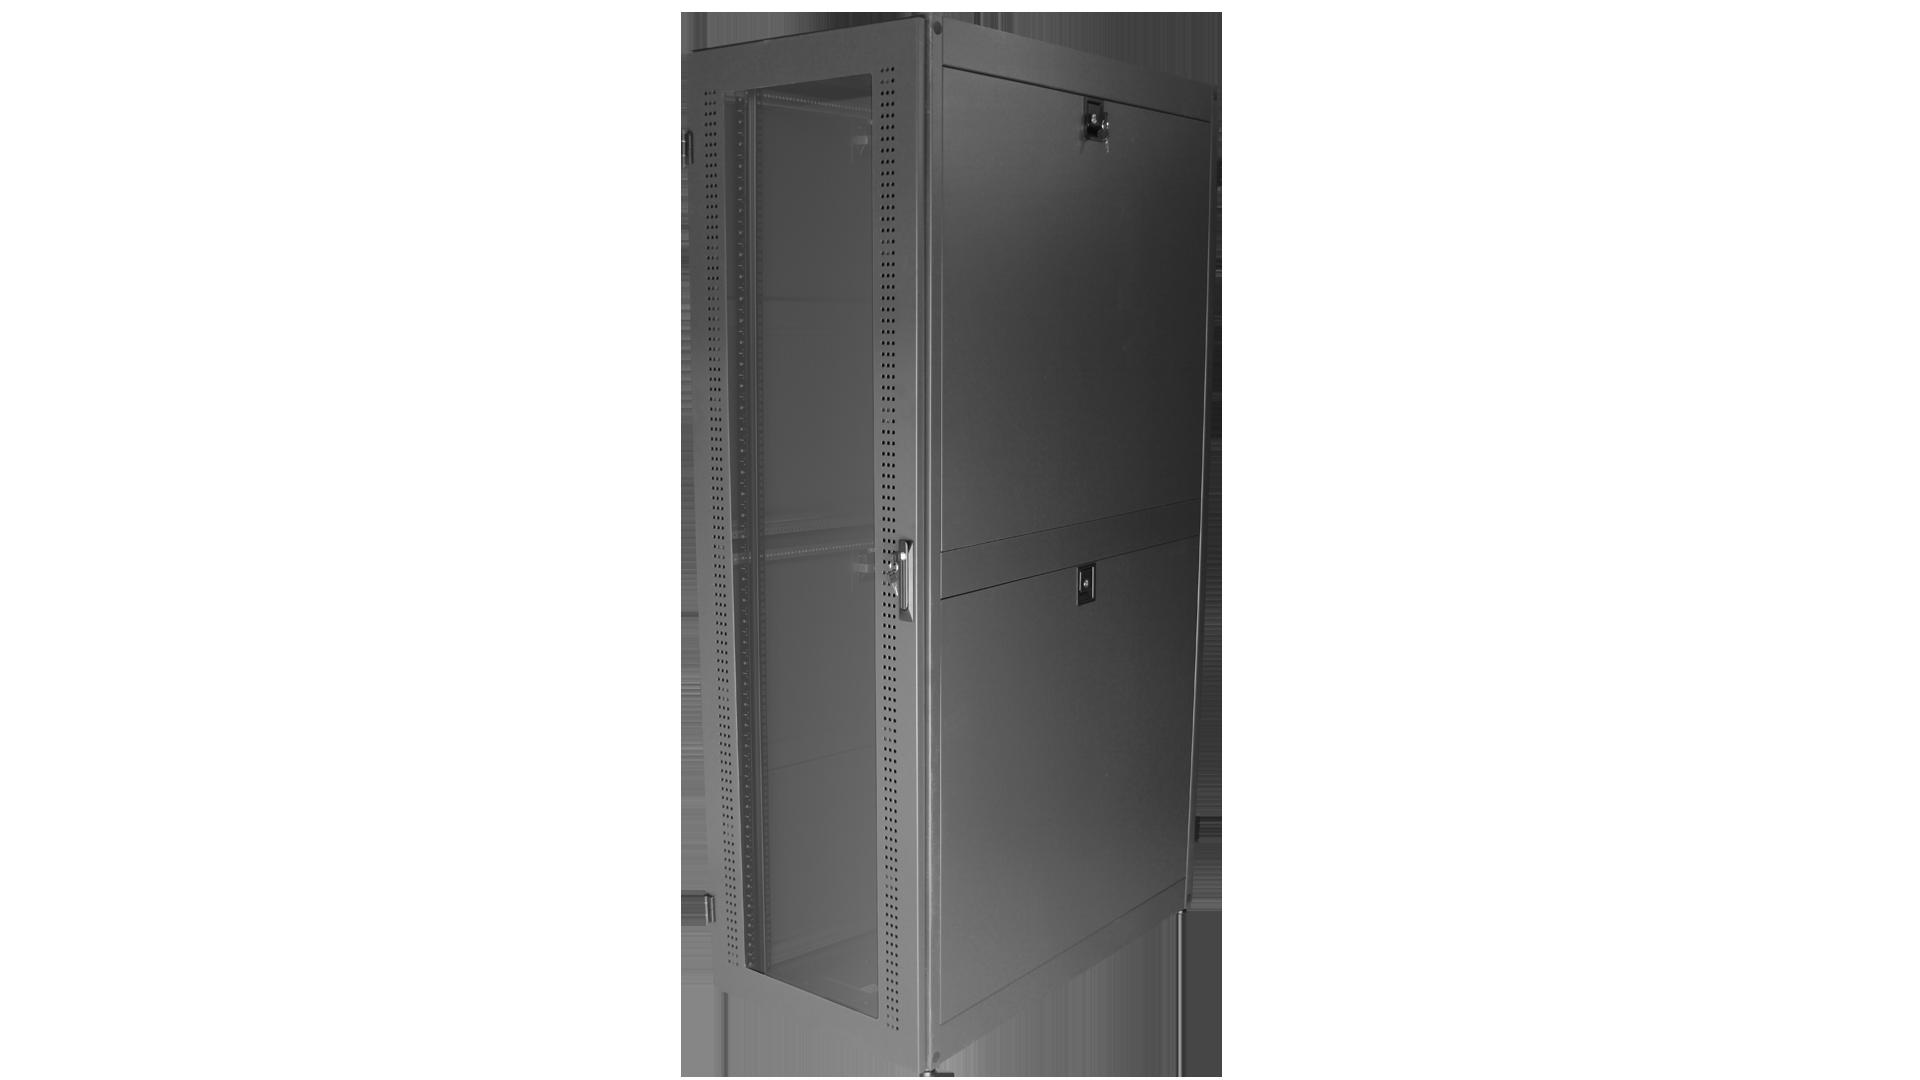 MOR-84ENC: Enclosed Rack with Enhanced-Ventilation